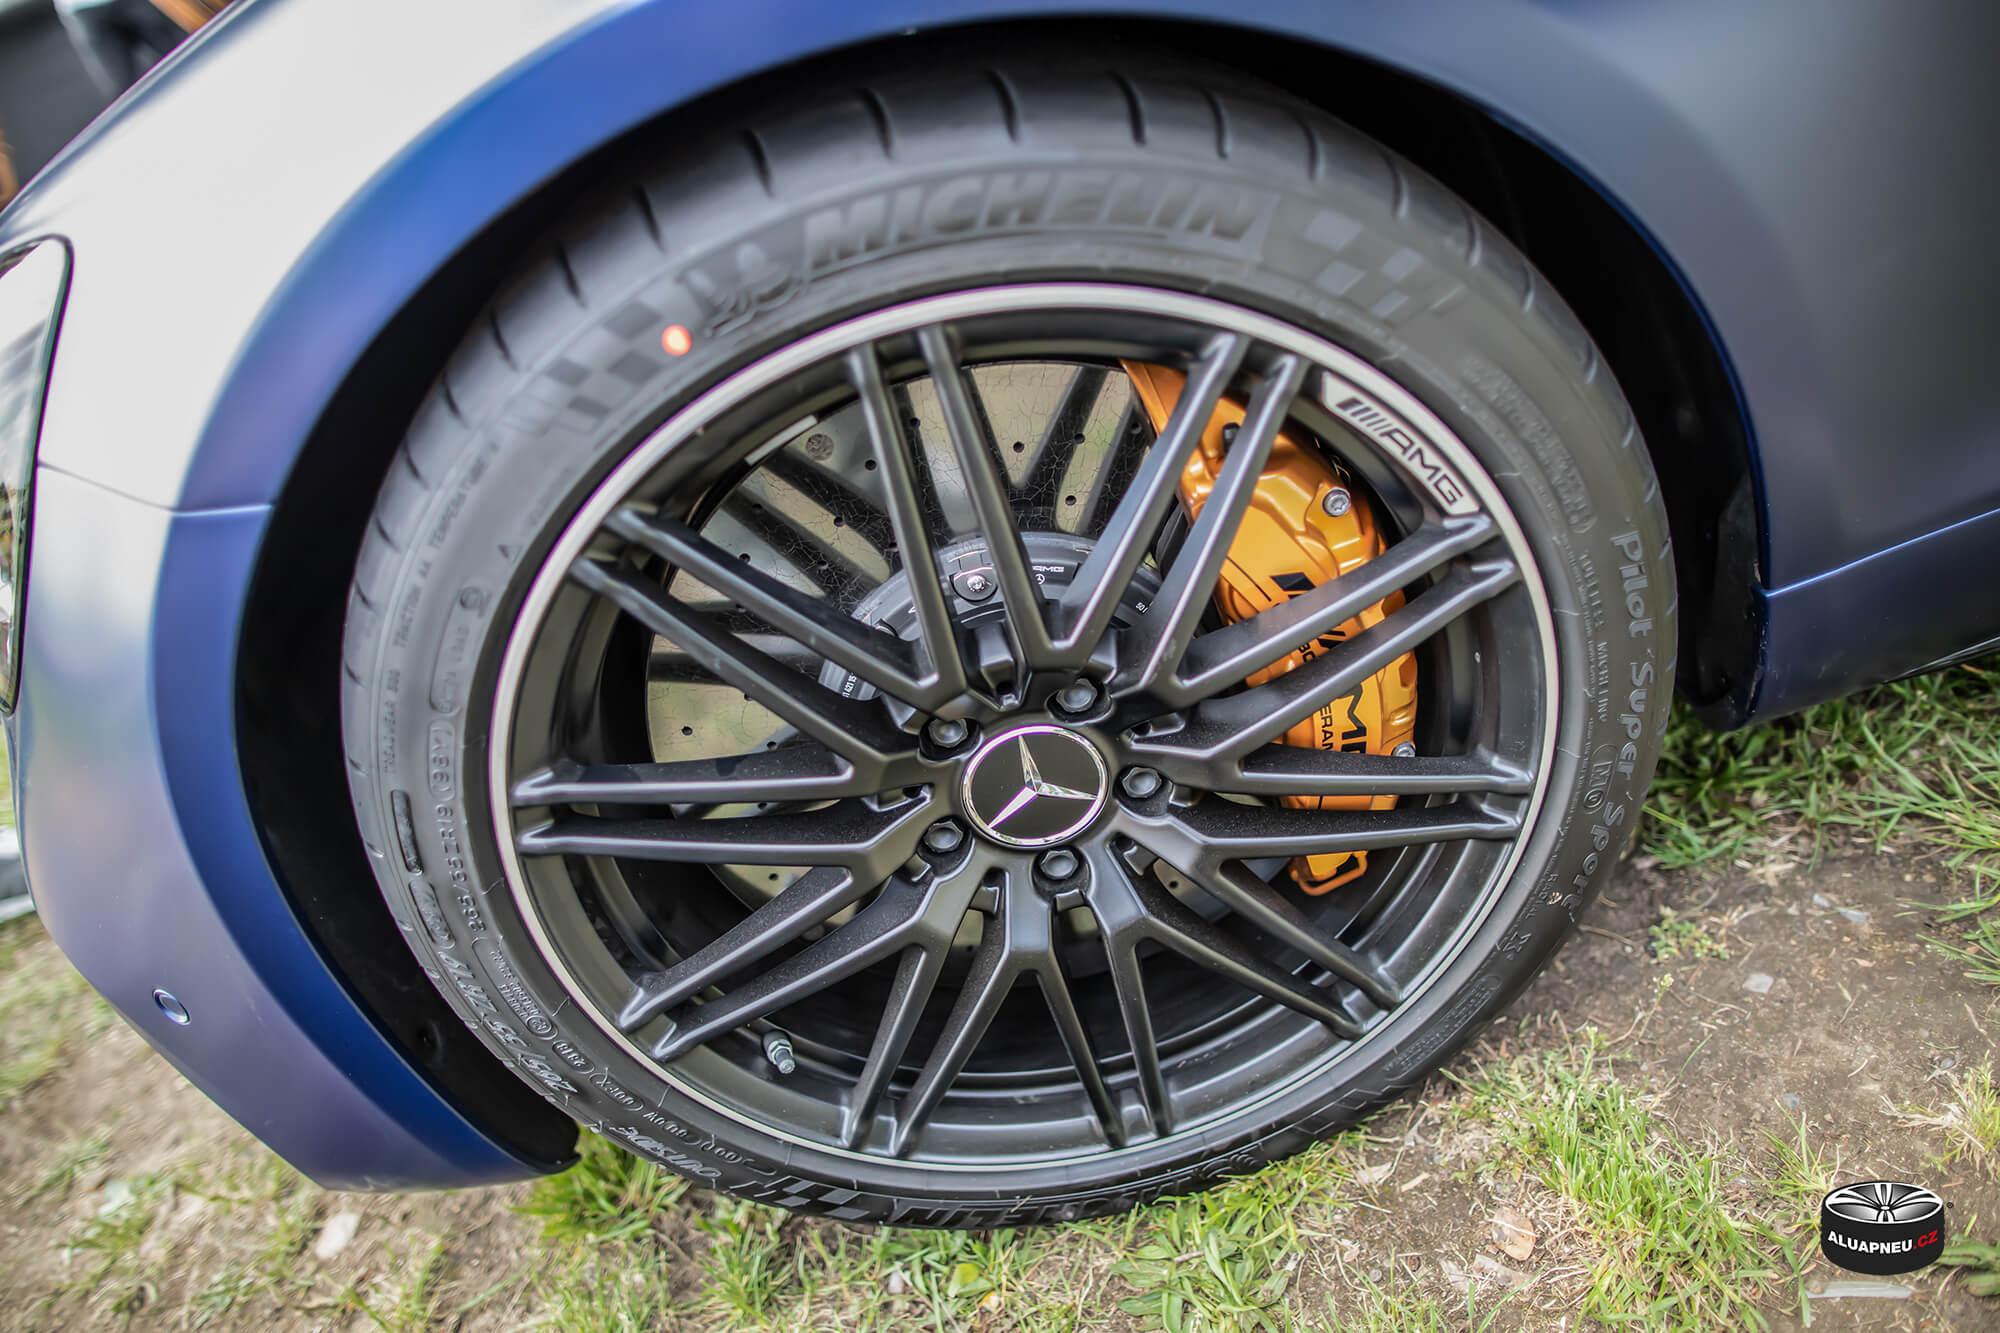 Originální alu kola Amg Mercedes - černé elektrony - Automobilové Legendy 2019 - www.aluapneu.cz